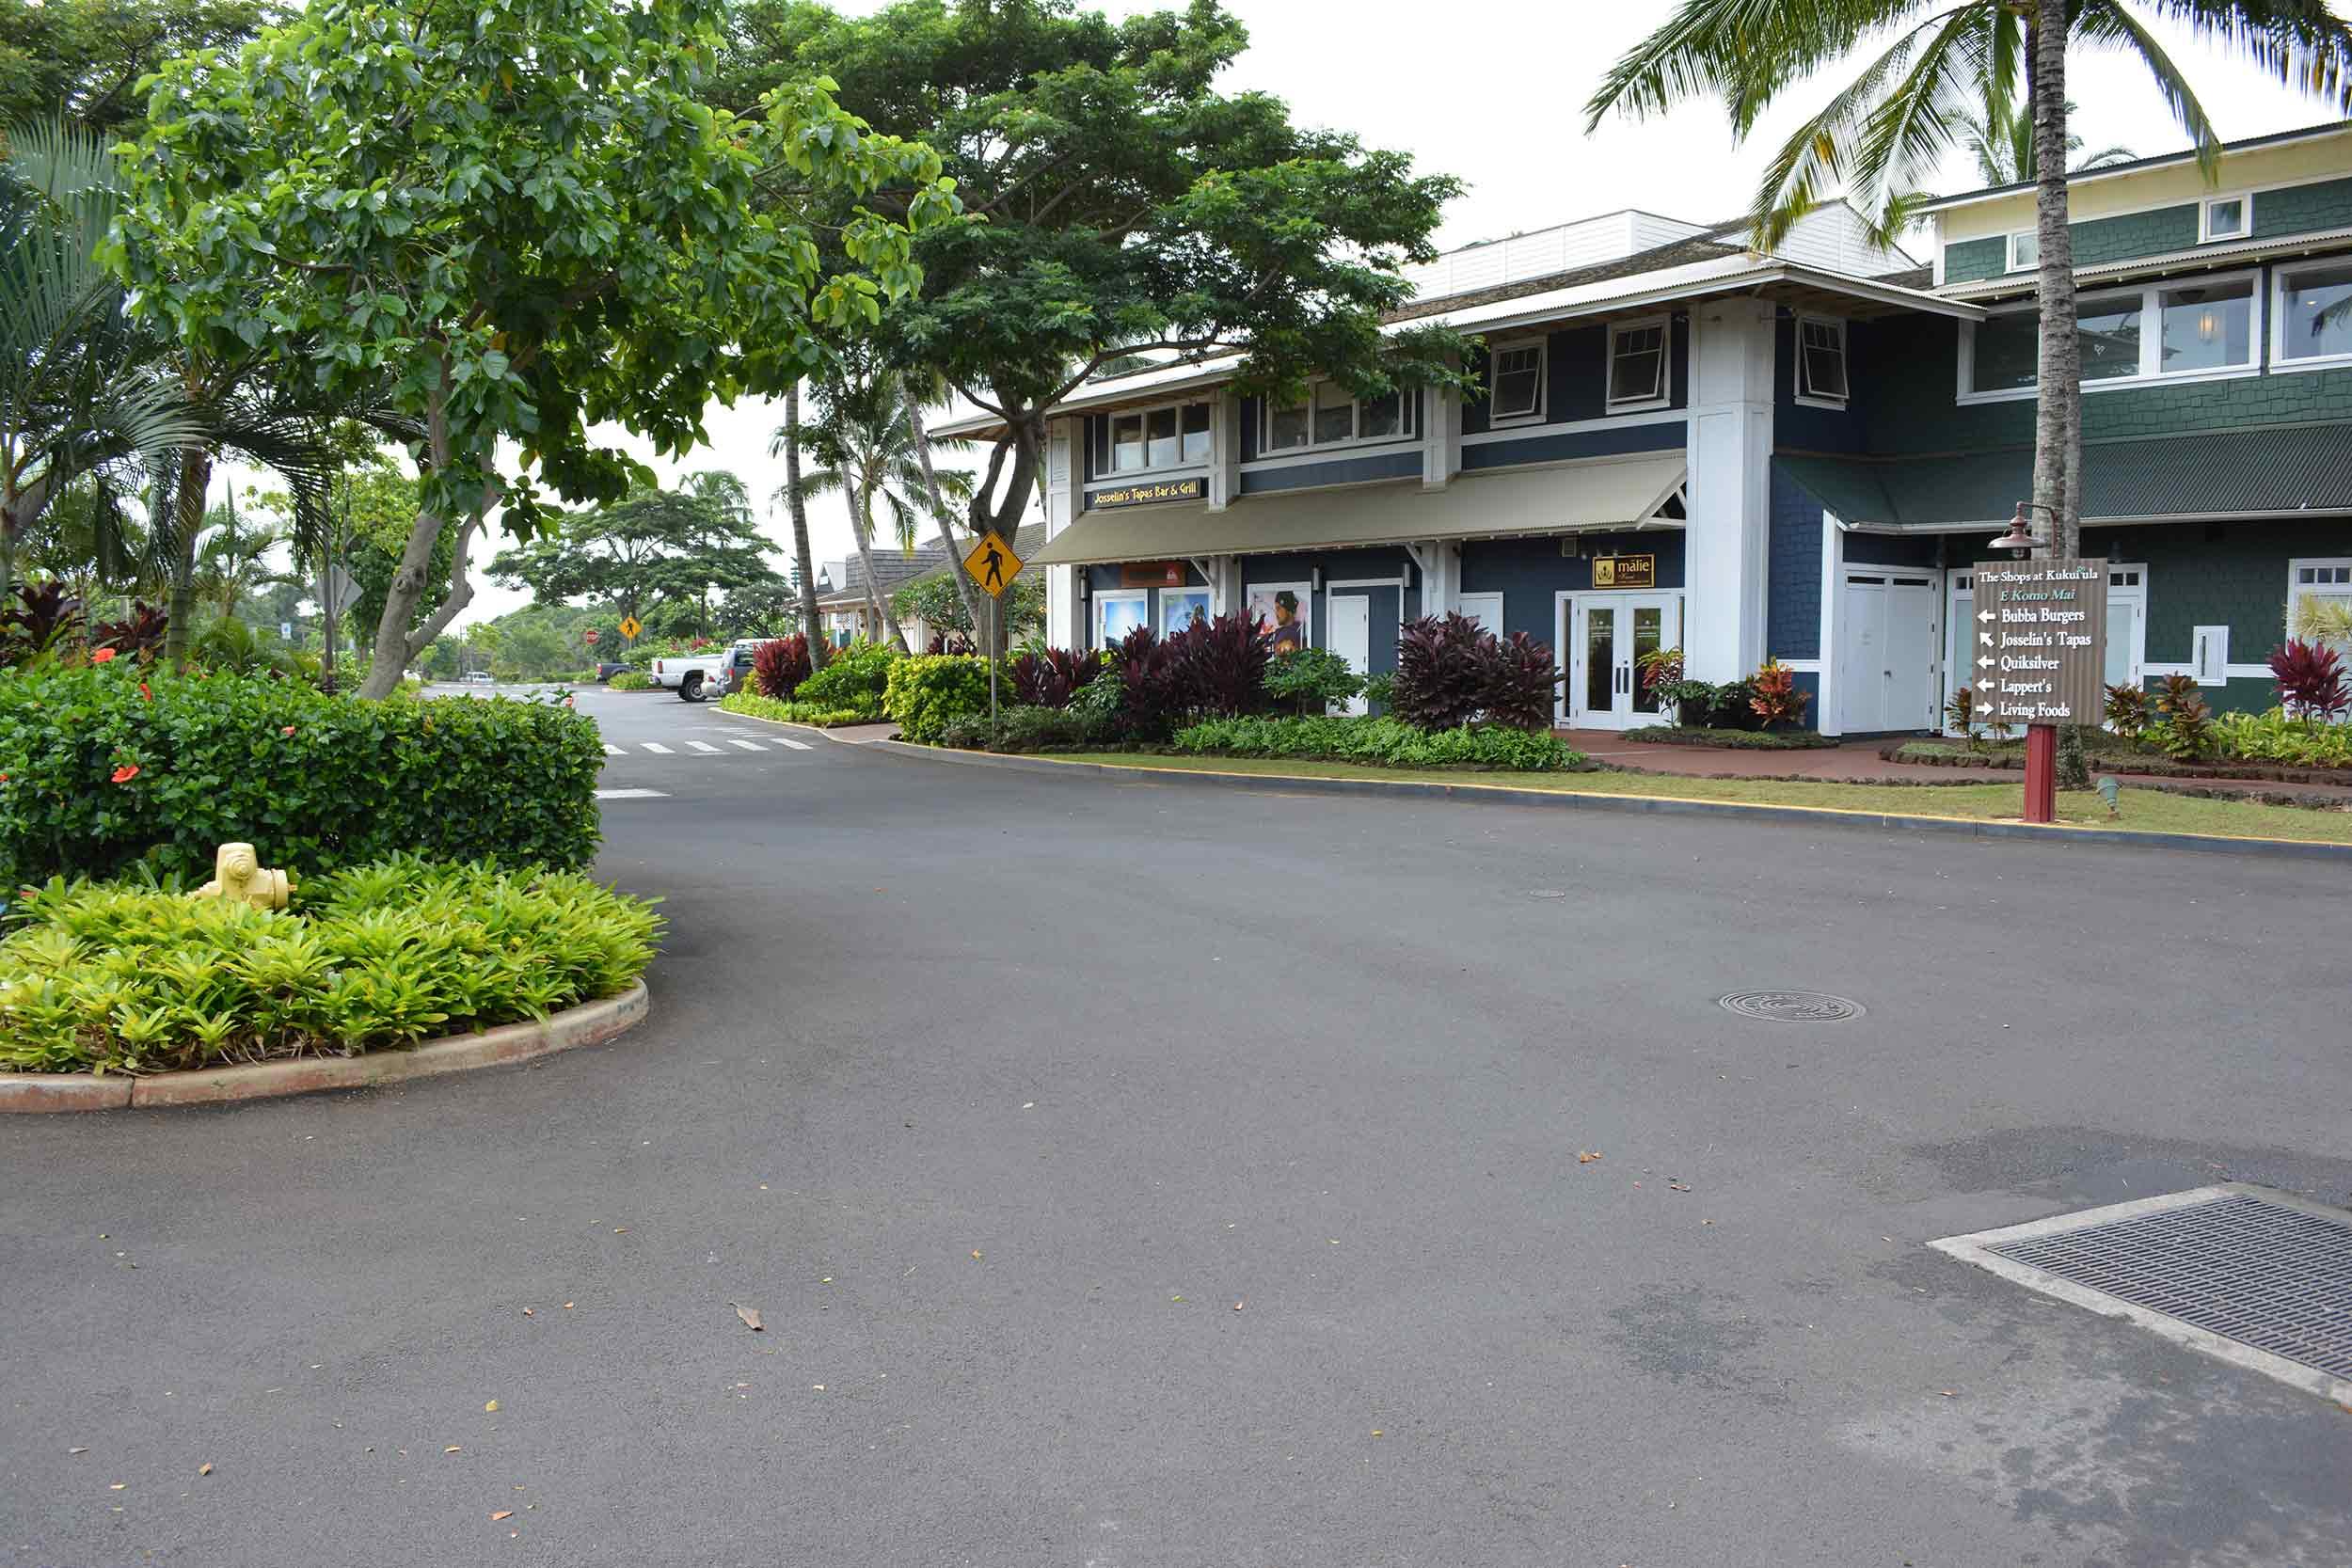 landscaping for shops at Kukuiula Kauai Hi